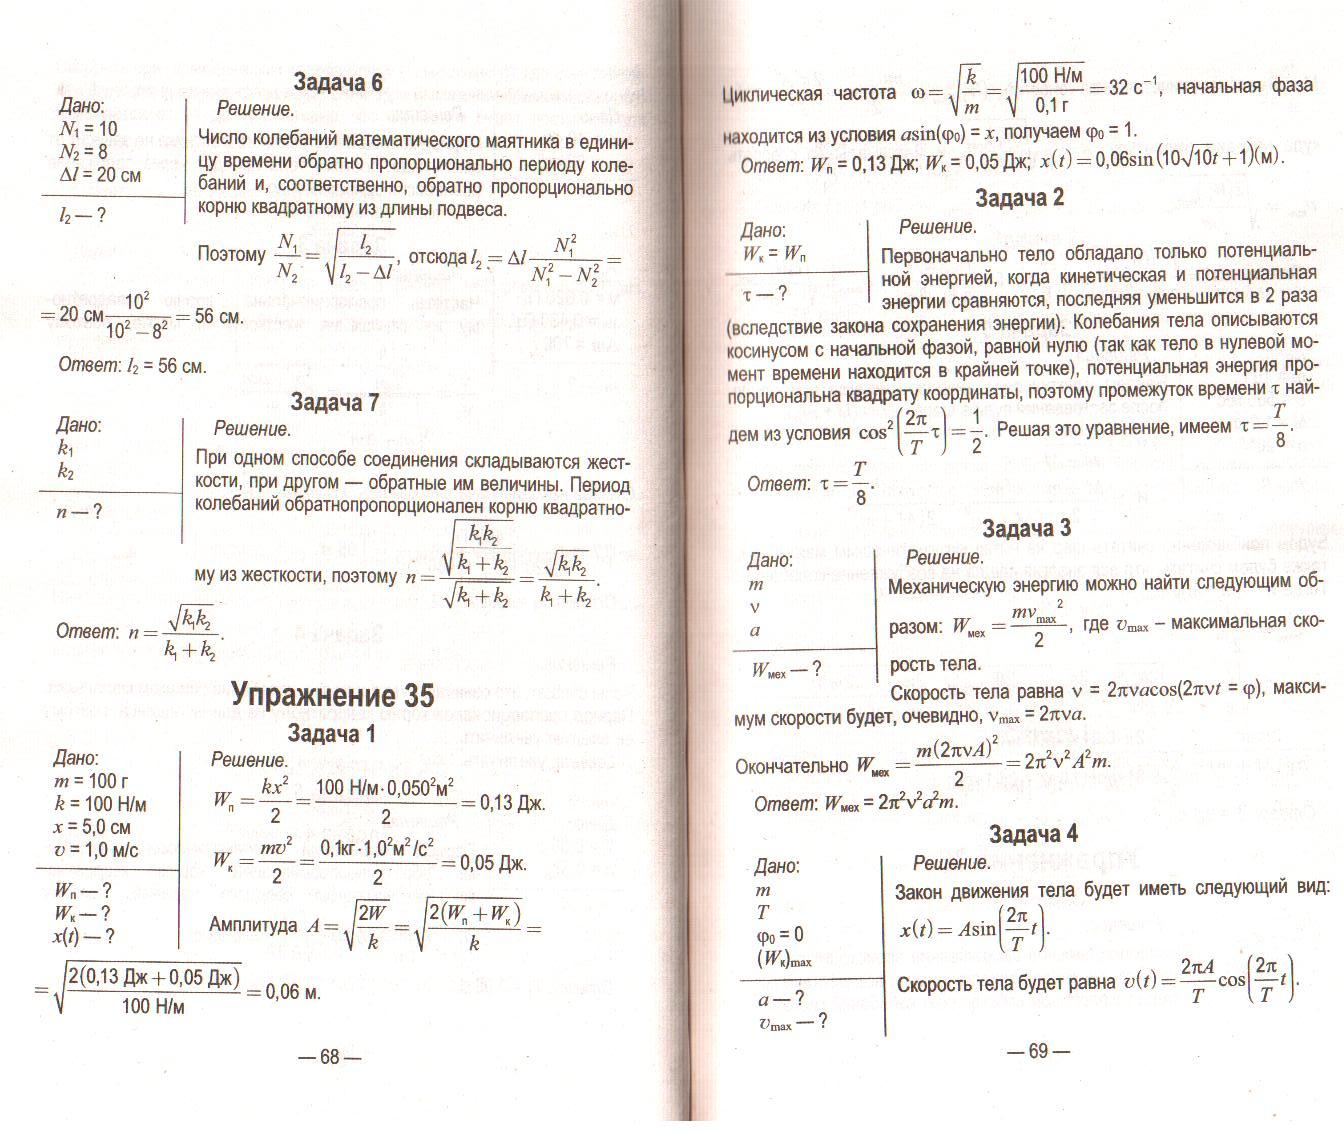 Решебник по физике 10 класс. Страницы 15